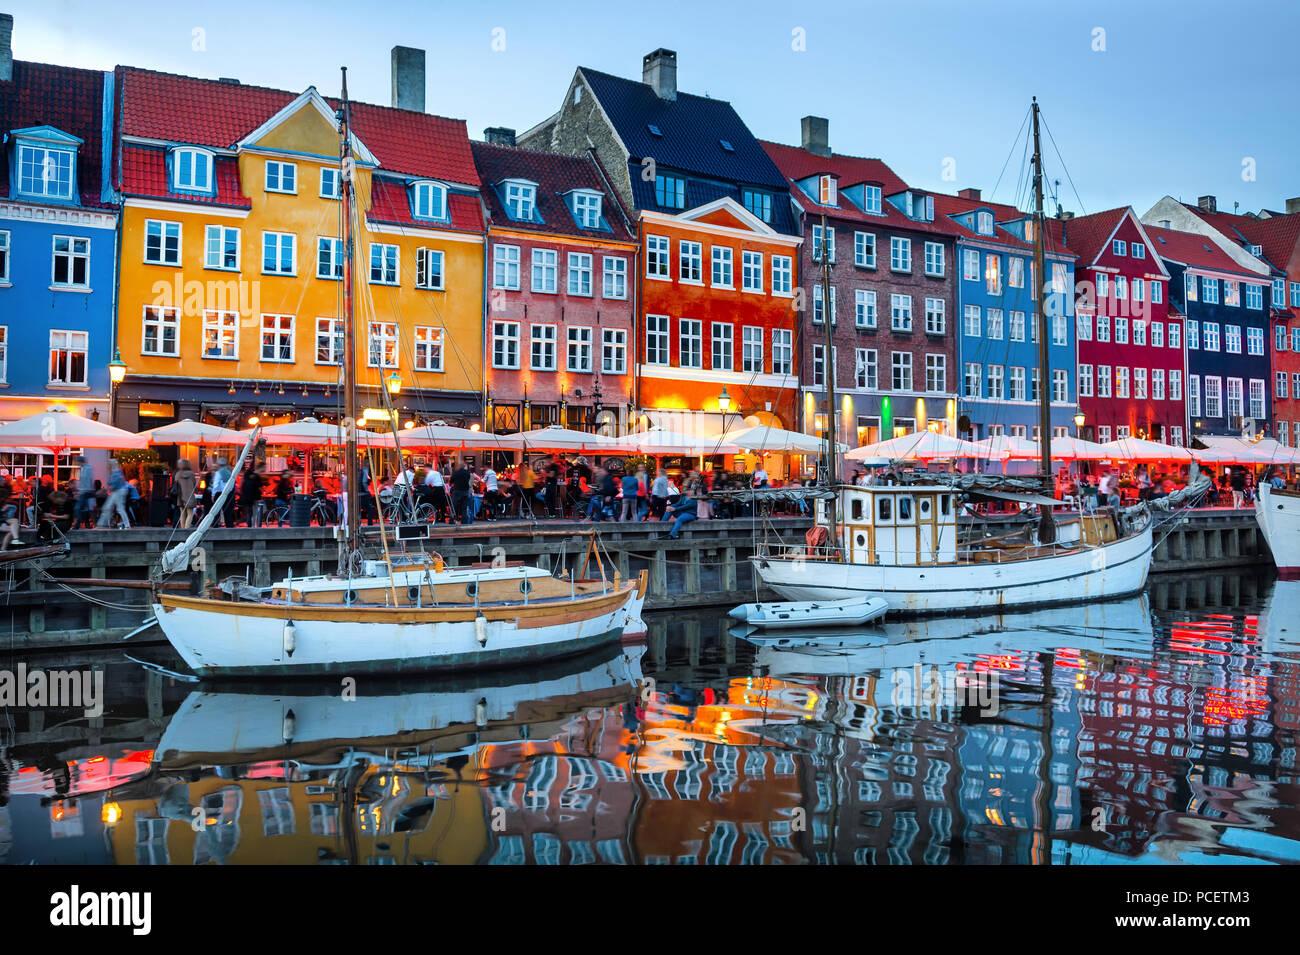 Segelboote von Nyhavn Promenade günstig beleuchtet am Abend, Kopenhagener Altstadt Stadtbild, Dänemark Stockbild